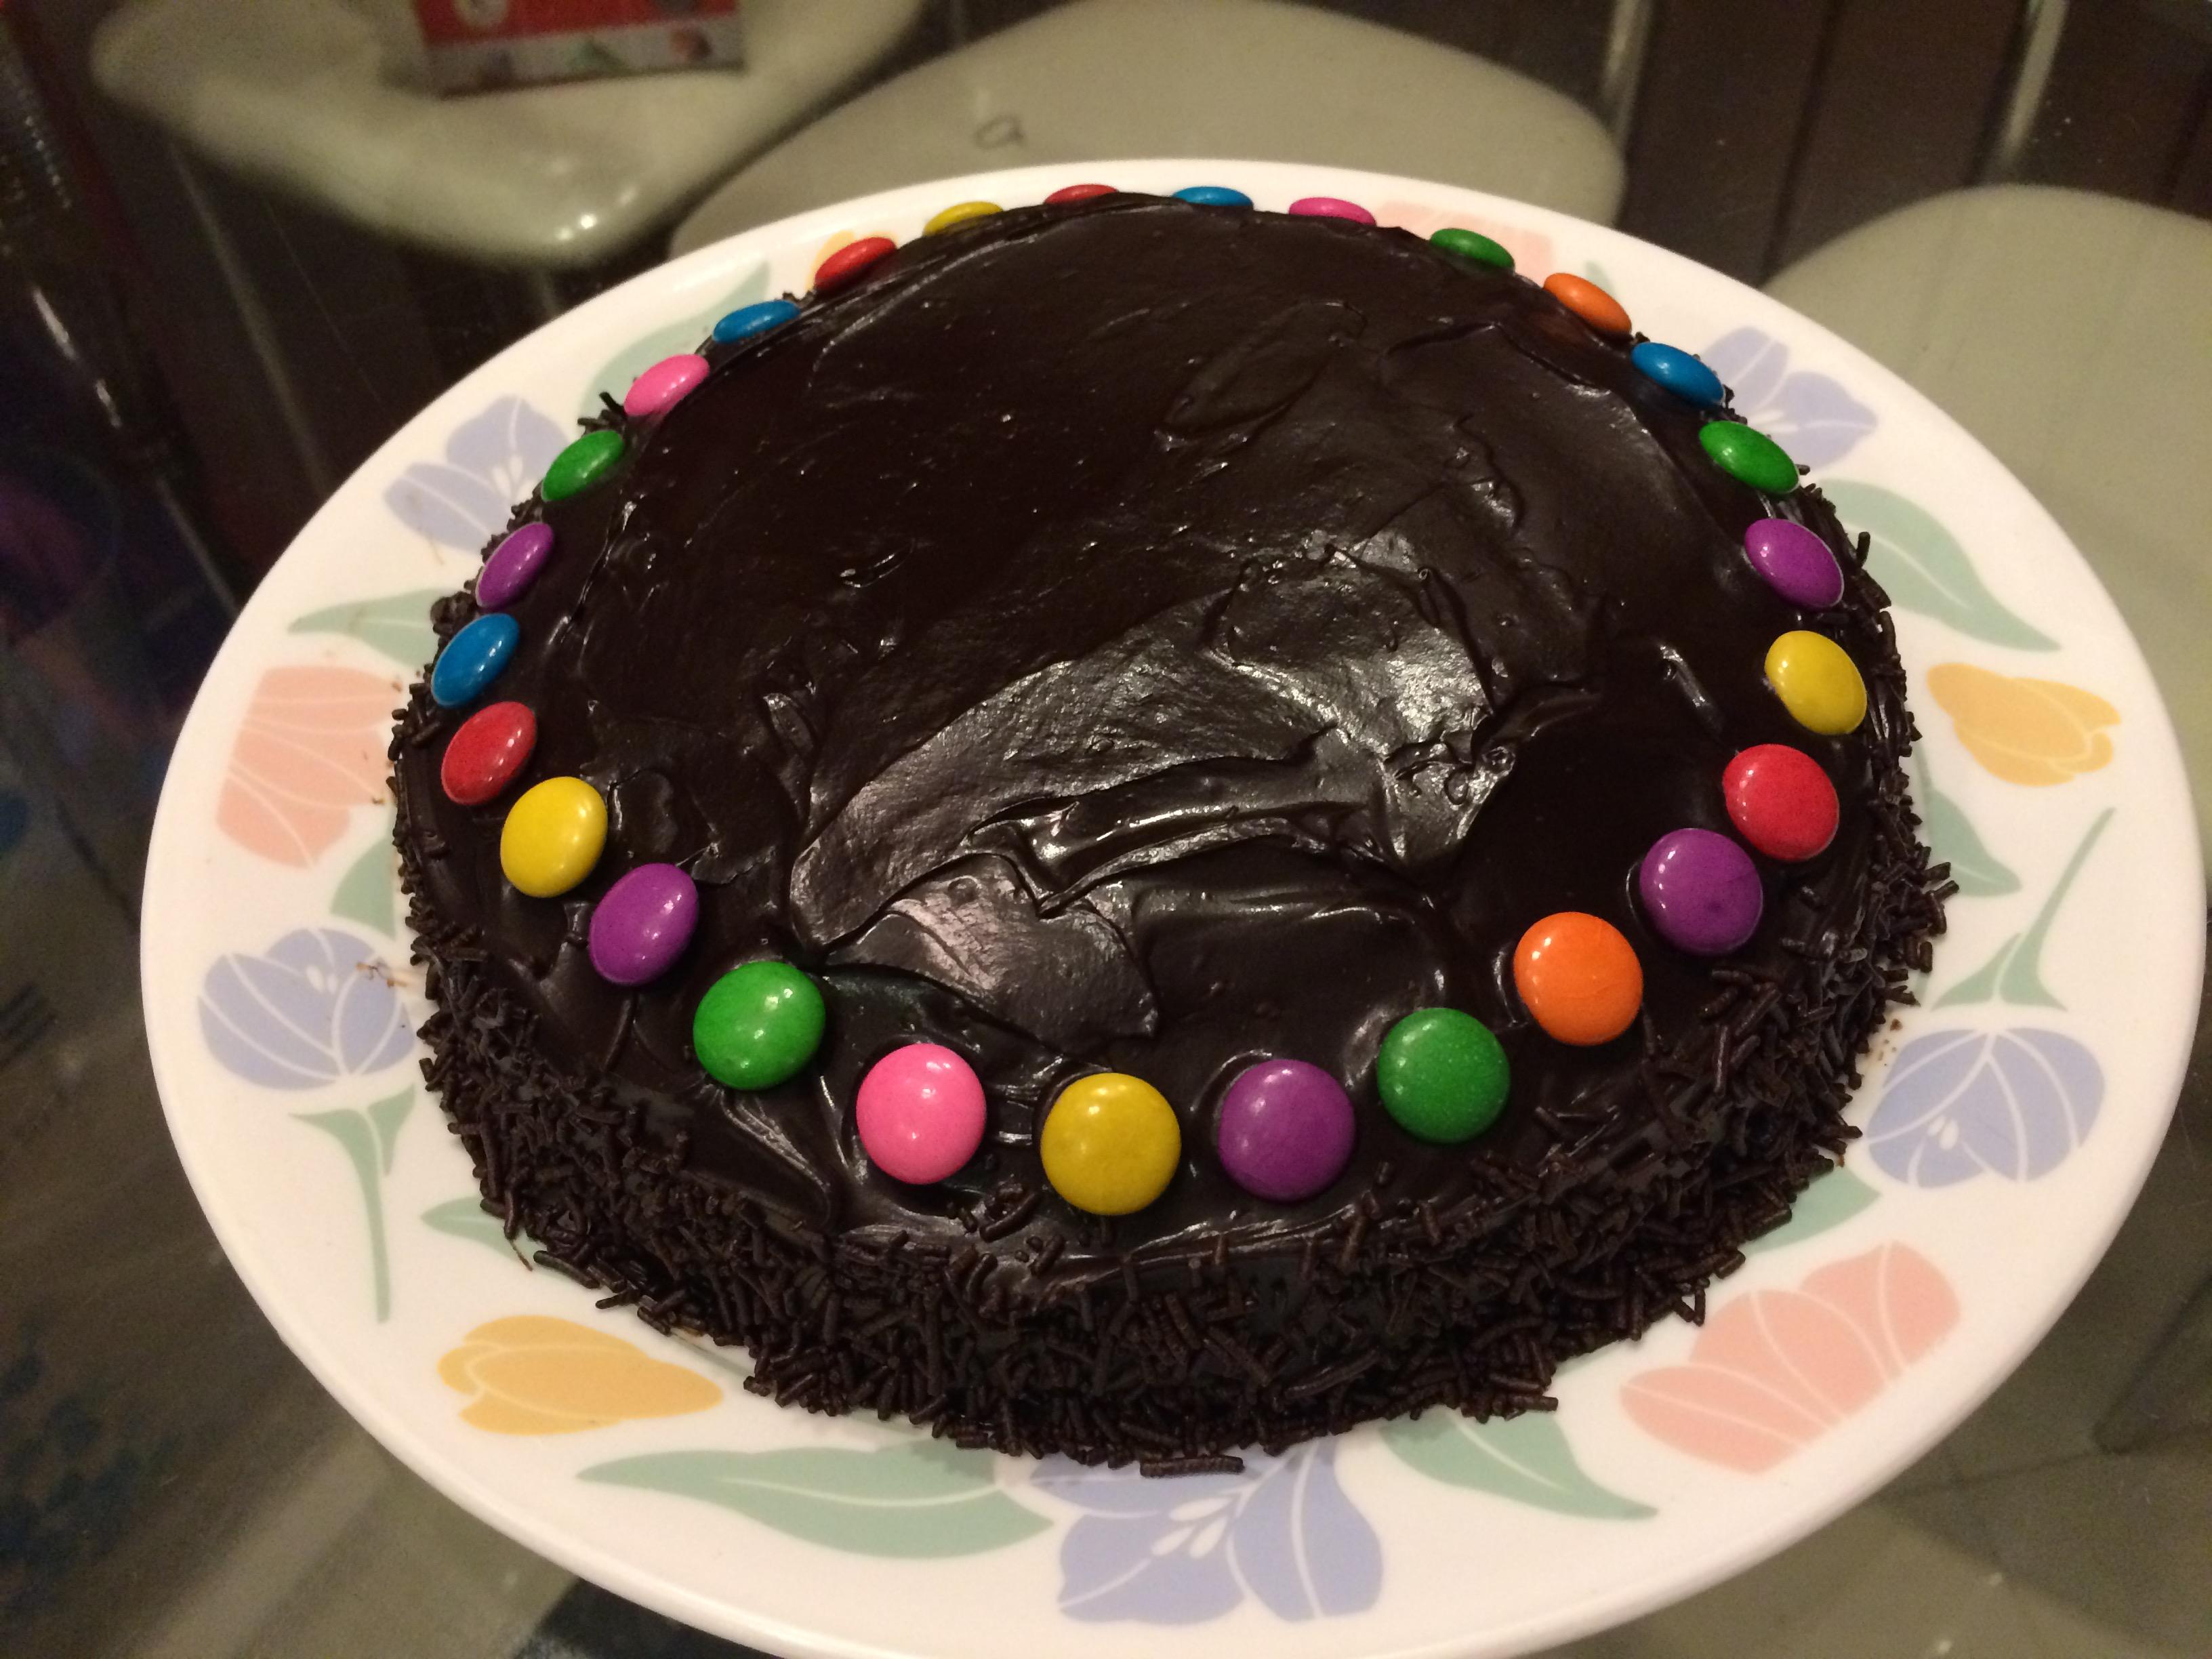 FileHomemade Chocolate Cake For KidsJPG